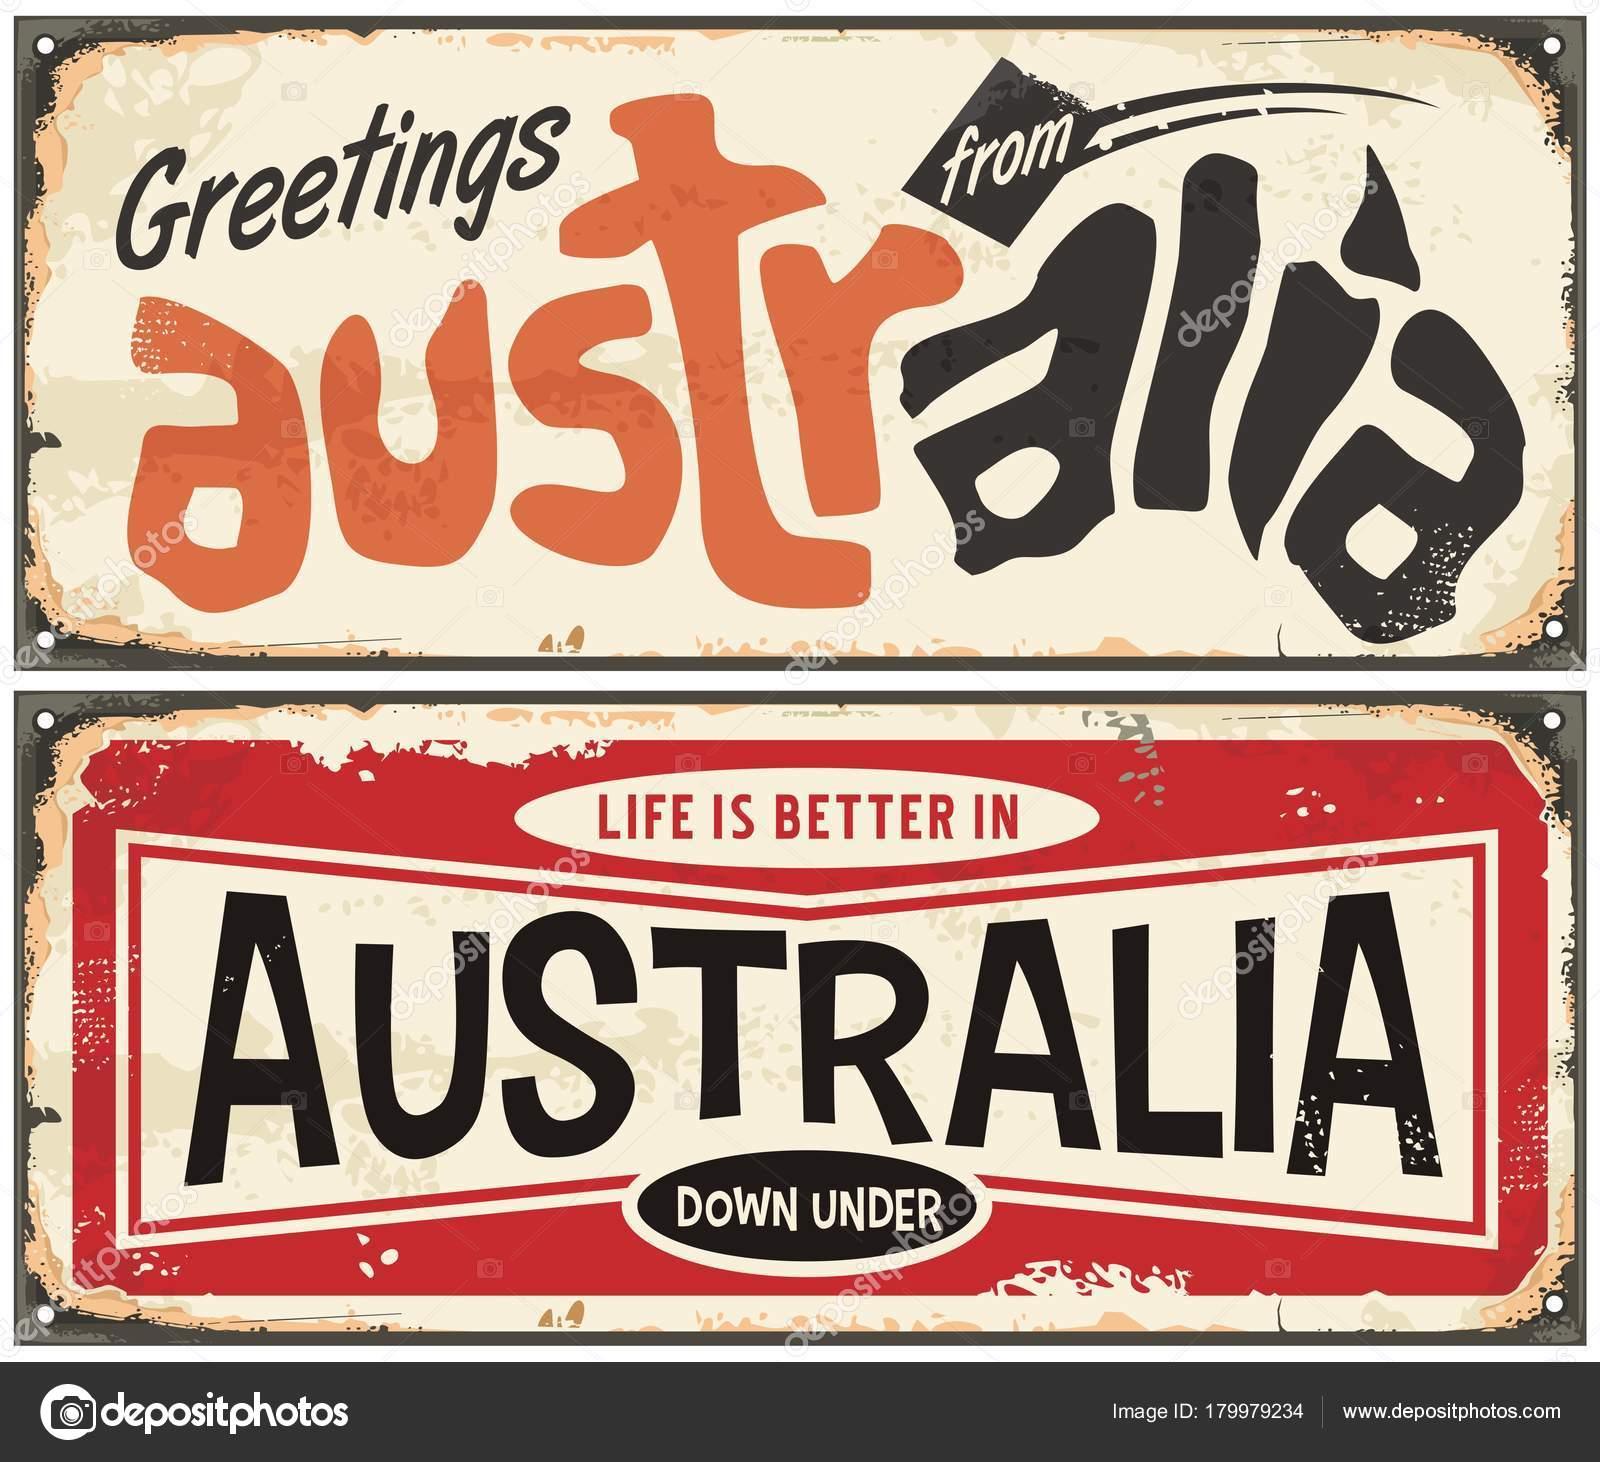 Greetings australia retro sign template life better australia greetings australia retro sign template life better australia vintage souvenir stock vector m4hsunfo